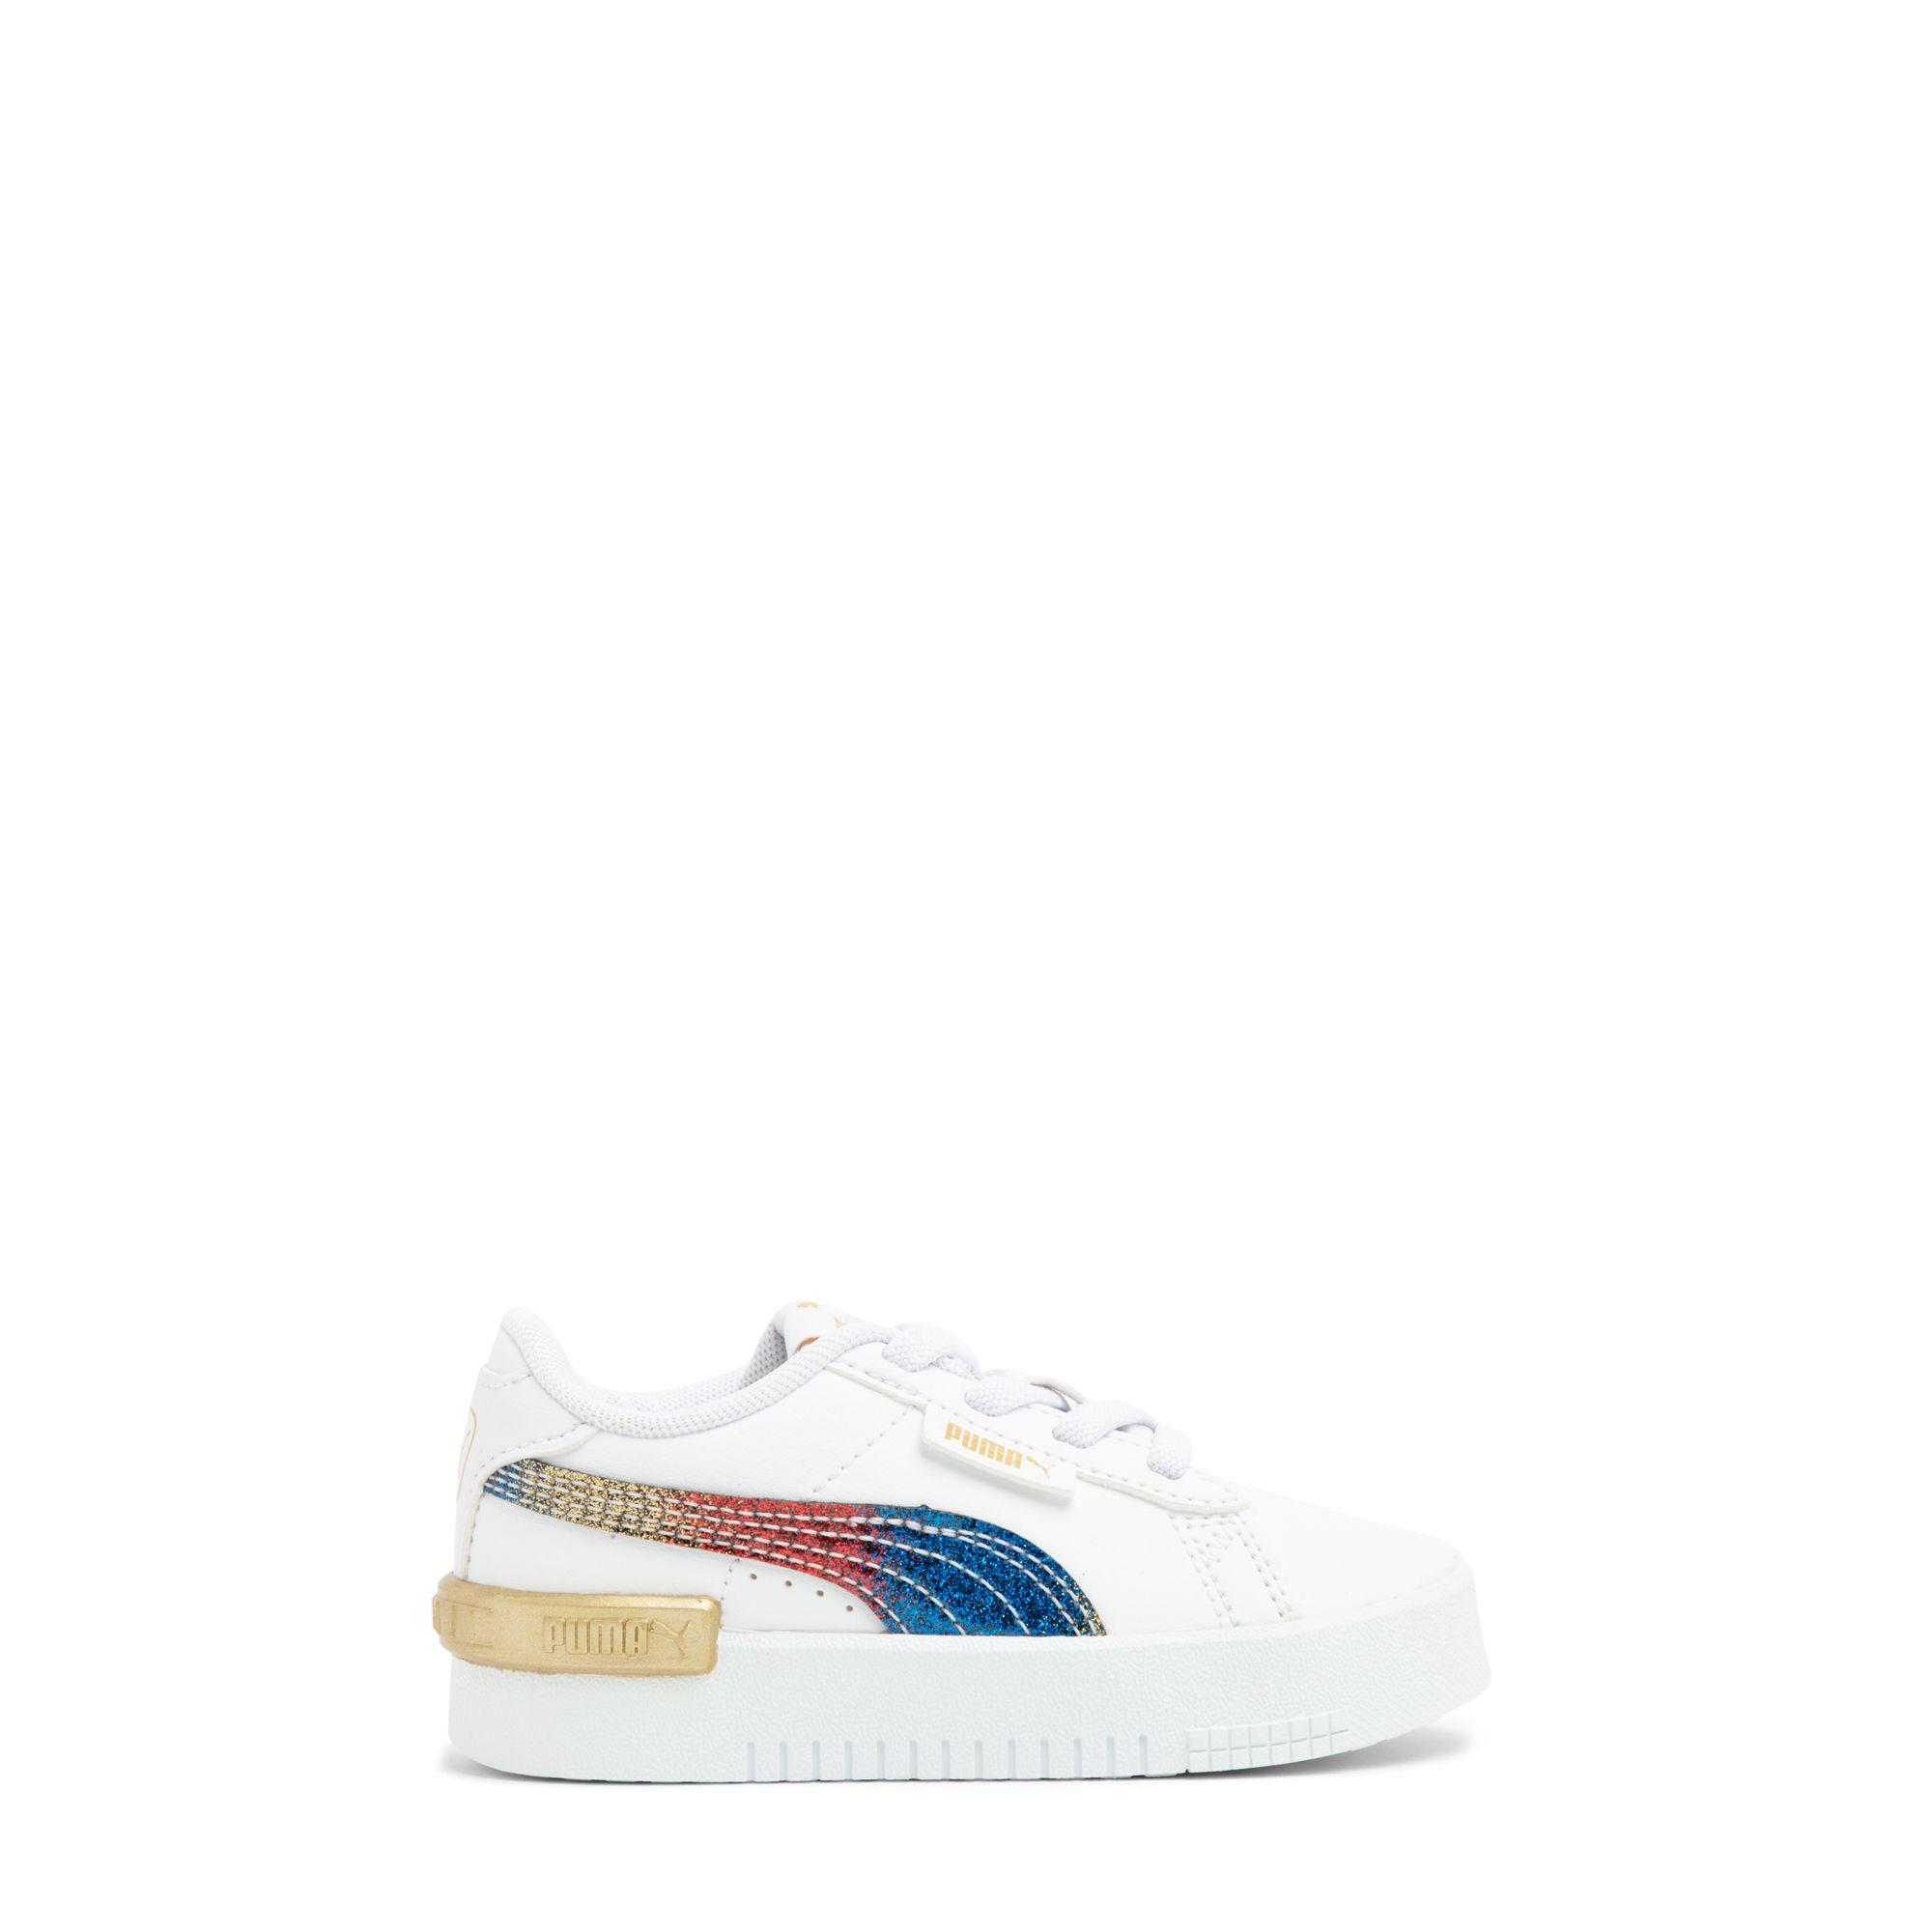 Jada Olympic sneakers